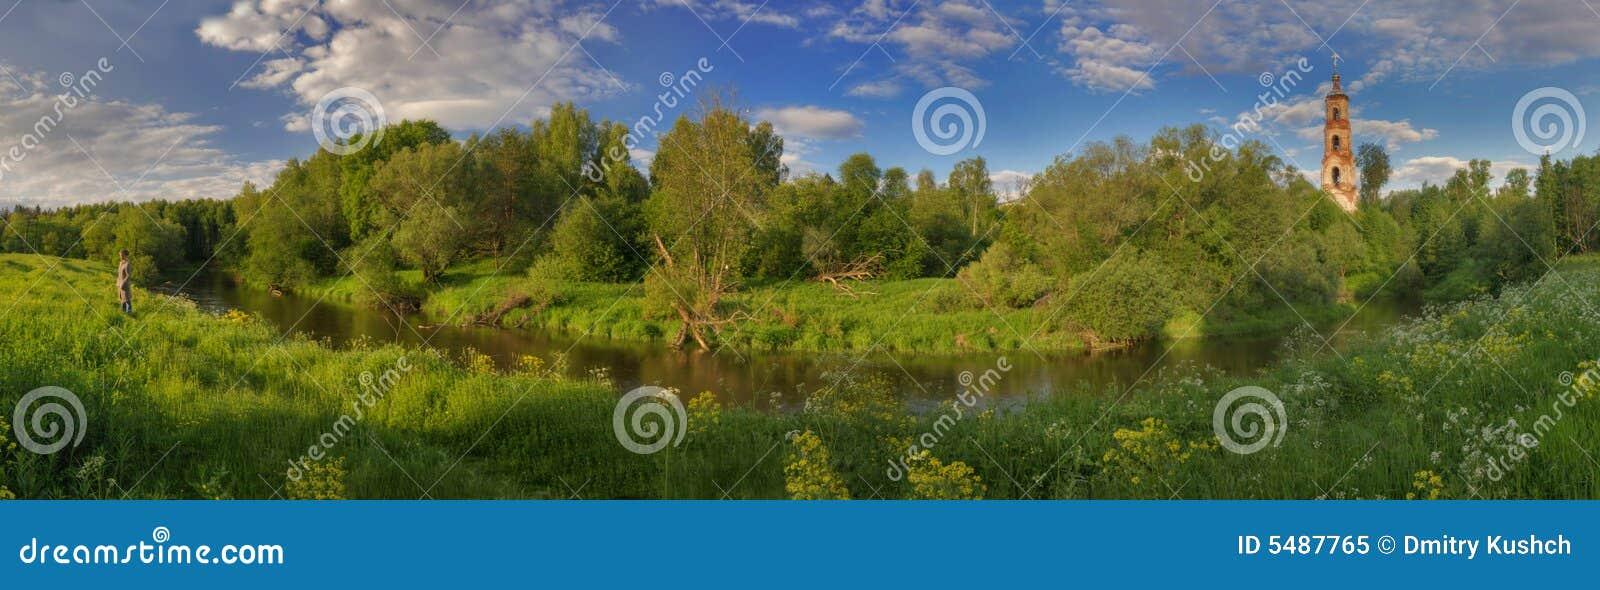 Panorama Rosji latem